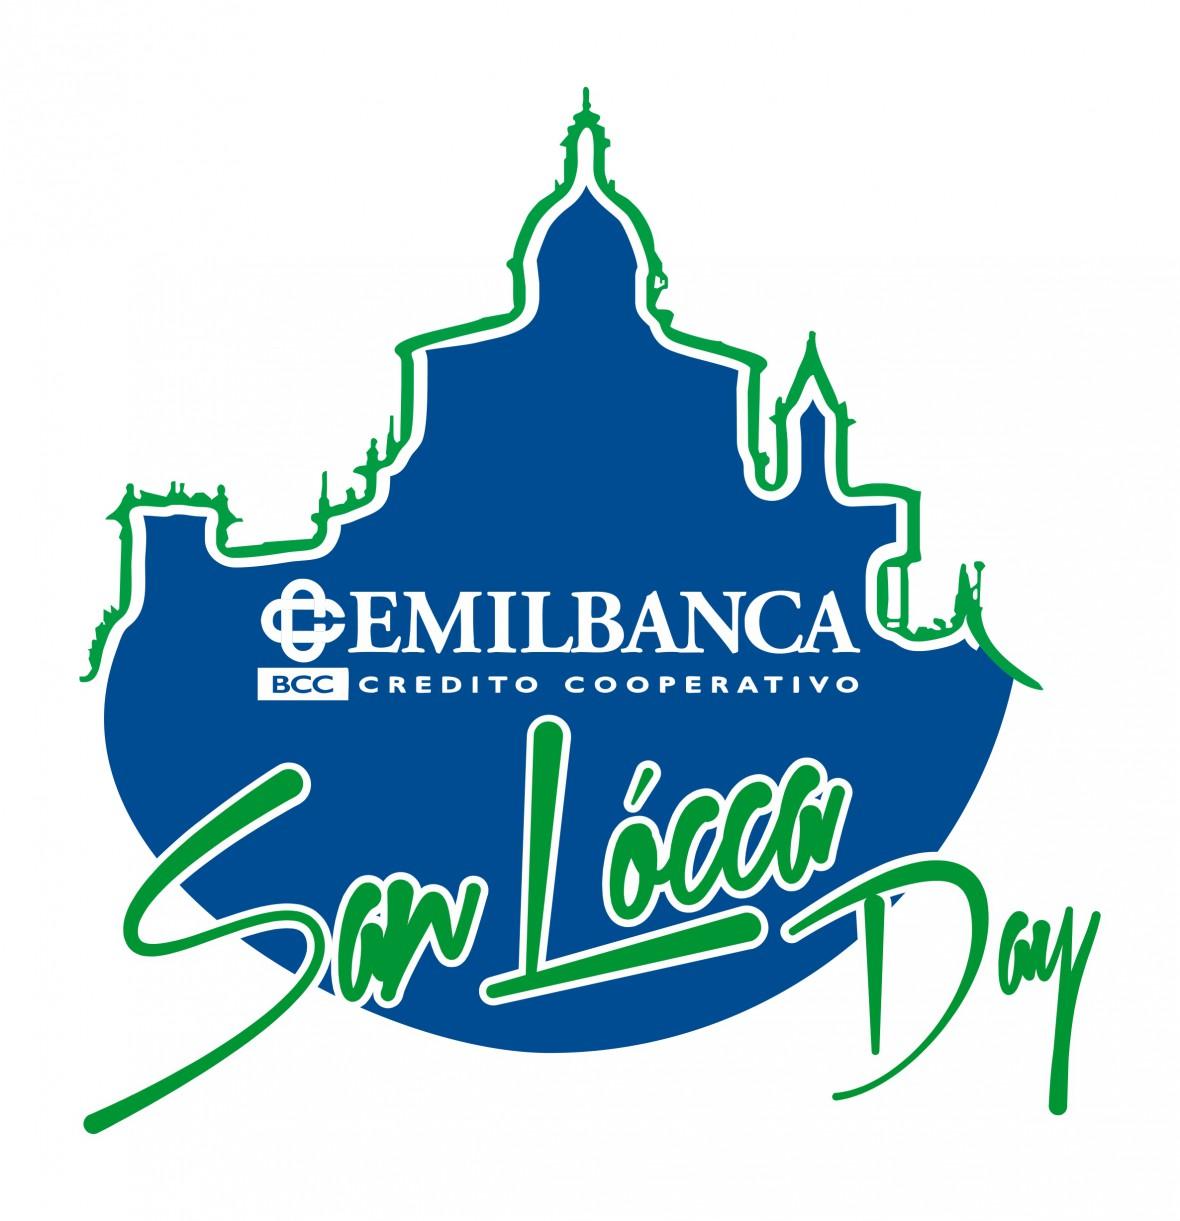 logo-SAN-LOCCA-2018